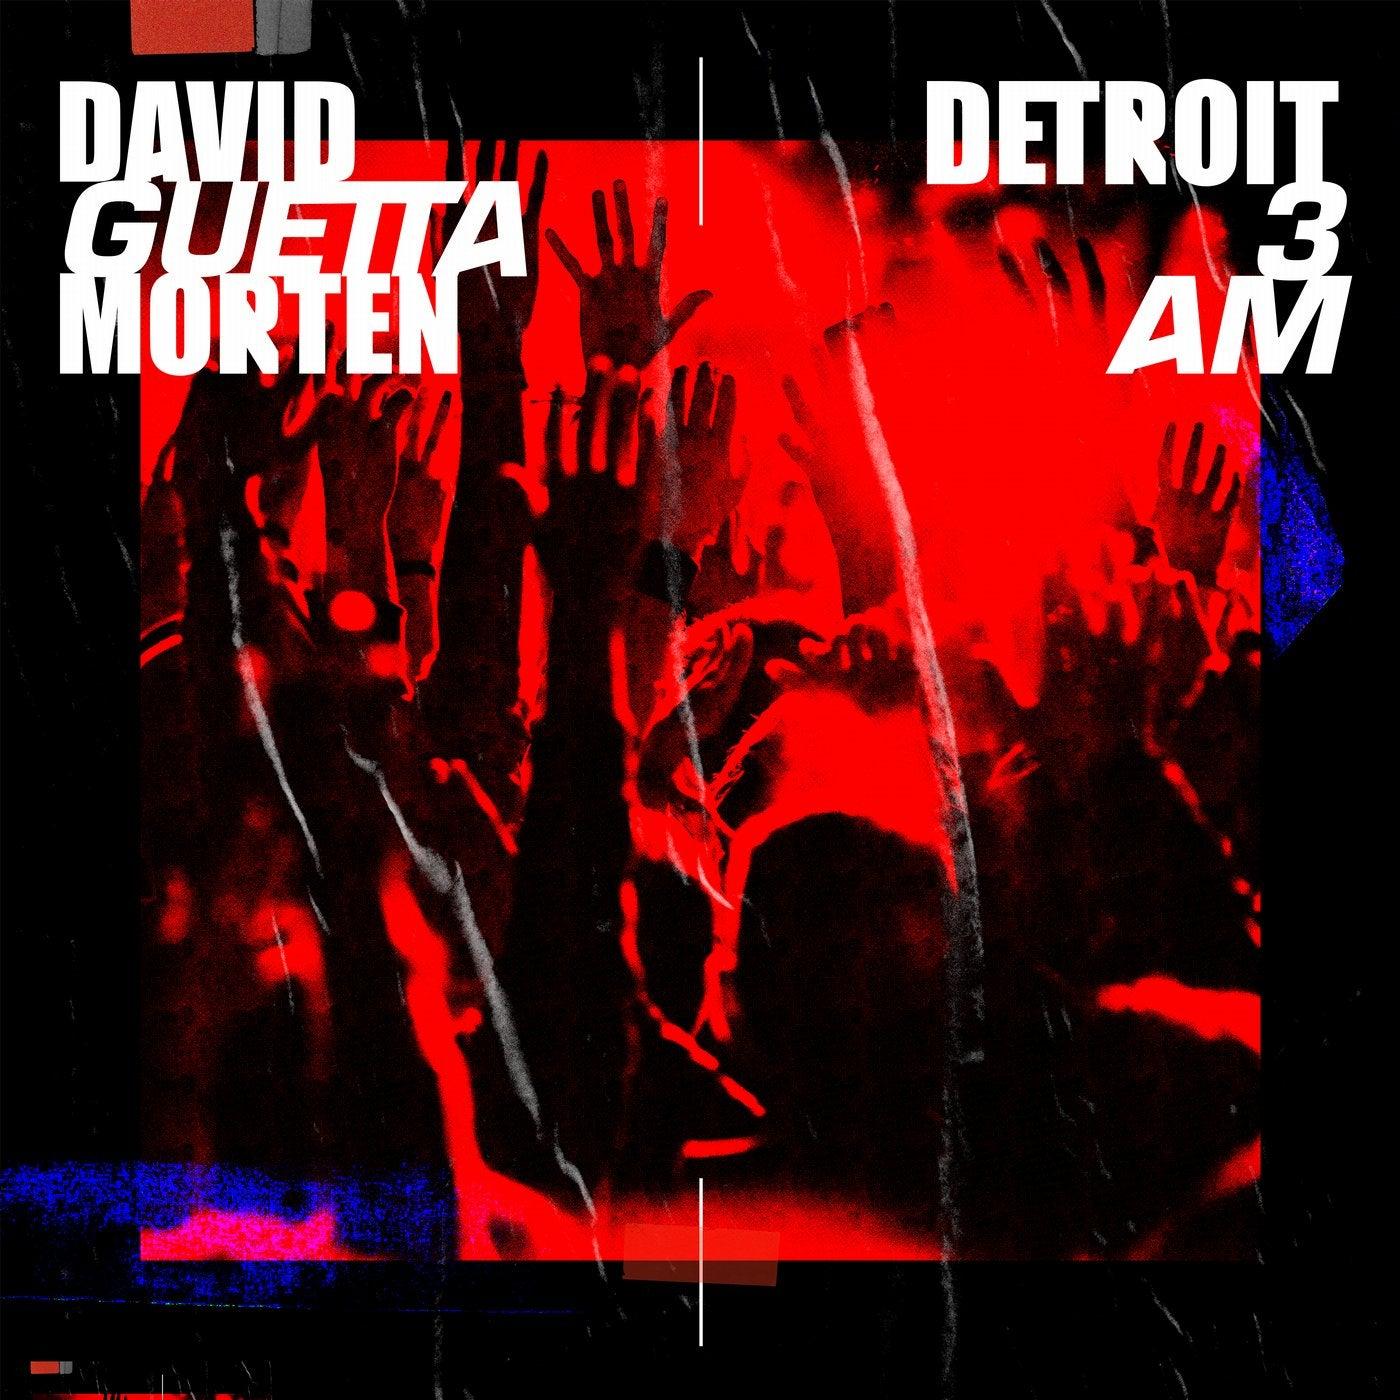 Detroit 3 AM (Extended)